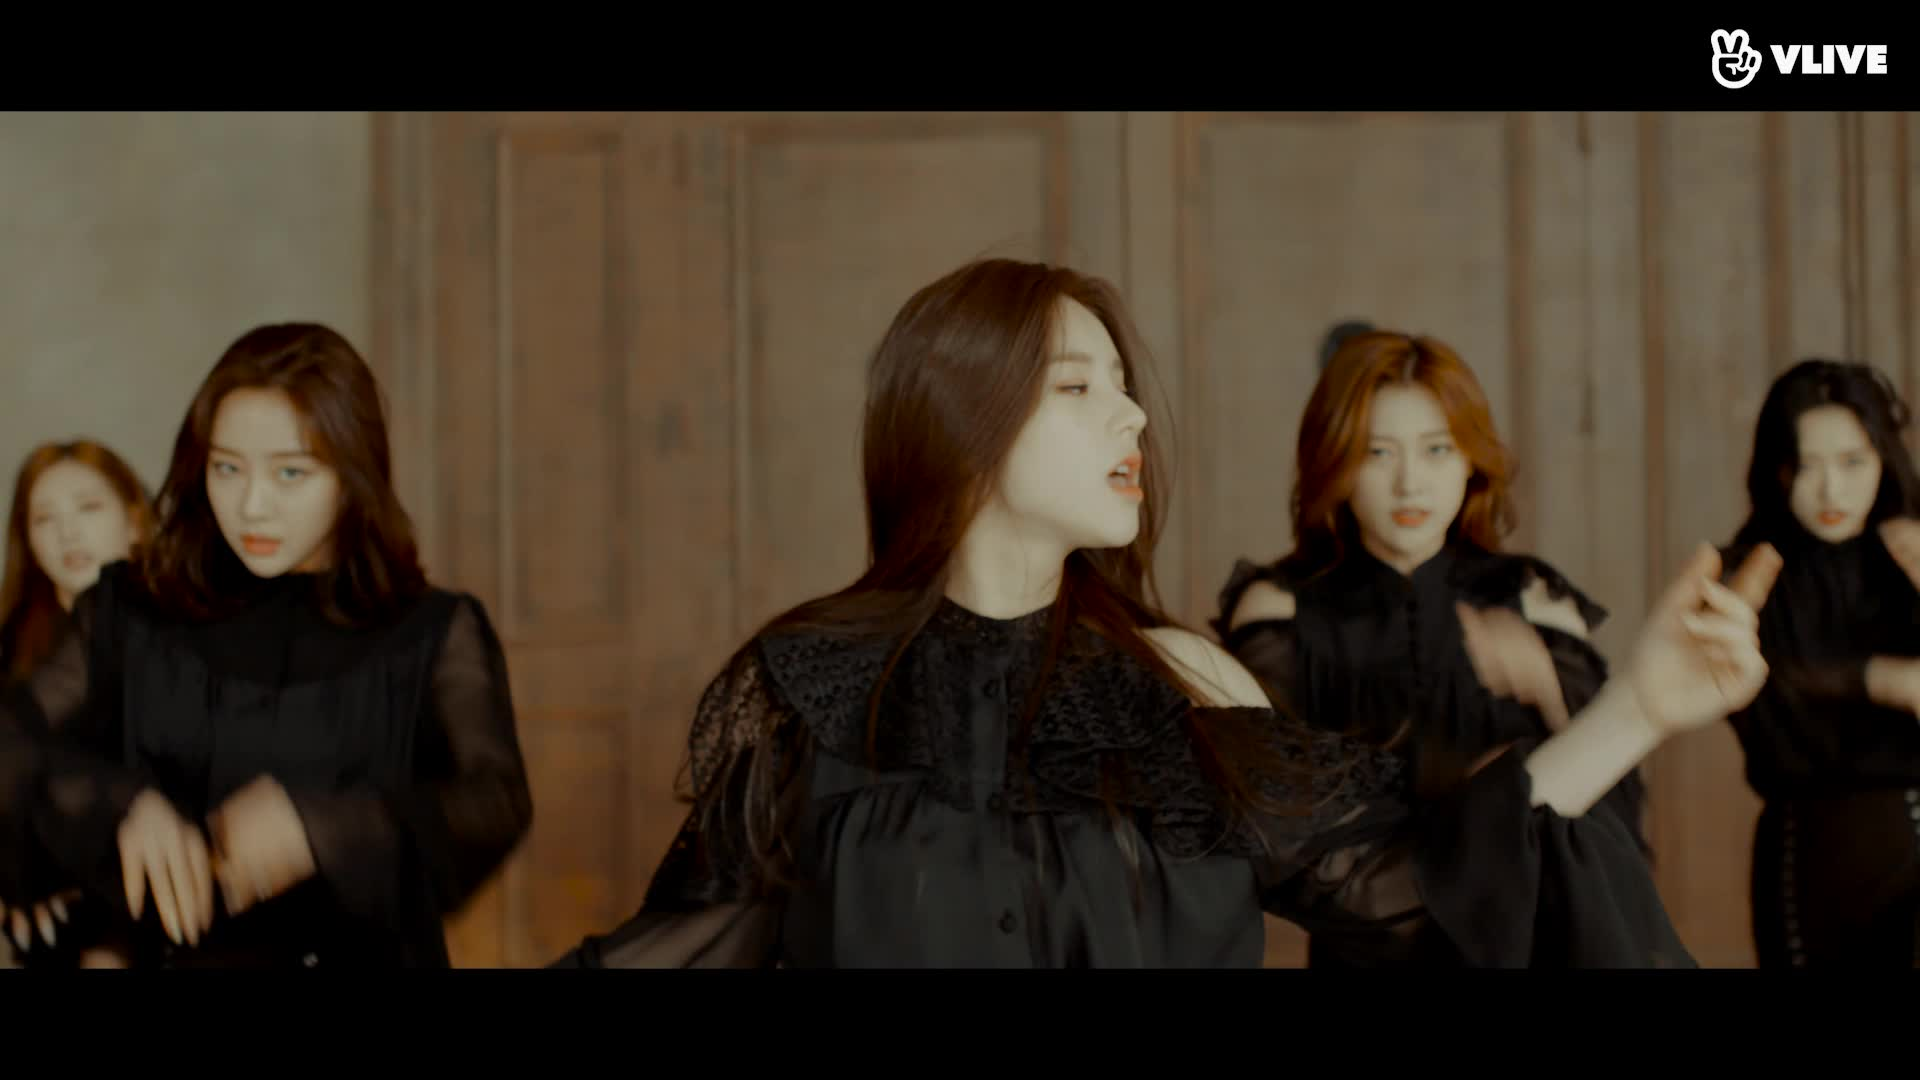 [MULTI/VERSE] Butterfly - 이달의 소녀(LOONA)